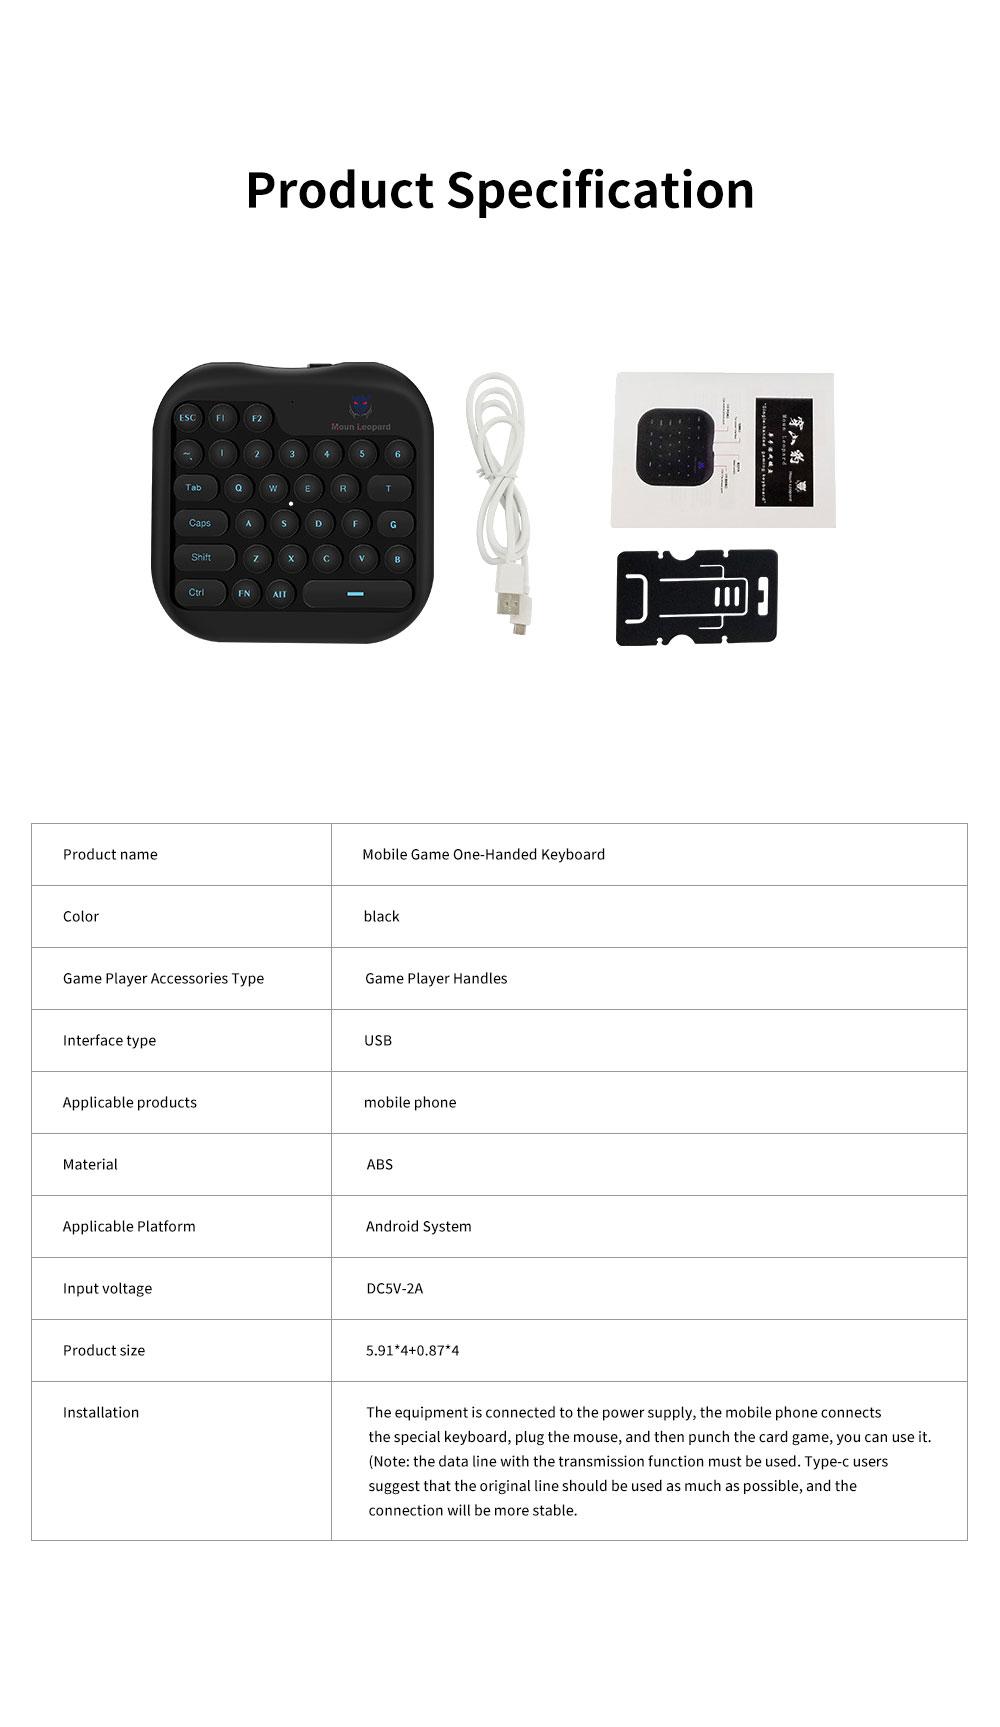 Mobile Game One-Handed Keyboard King Glory LOL Game Keyboard 6